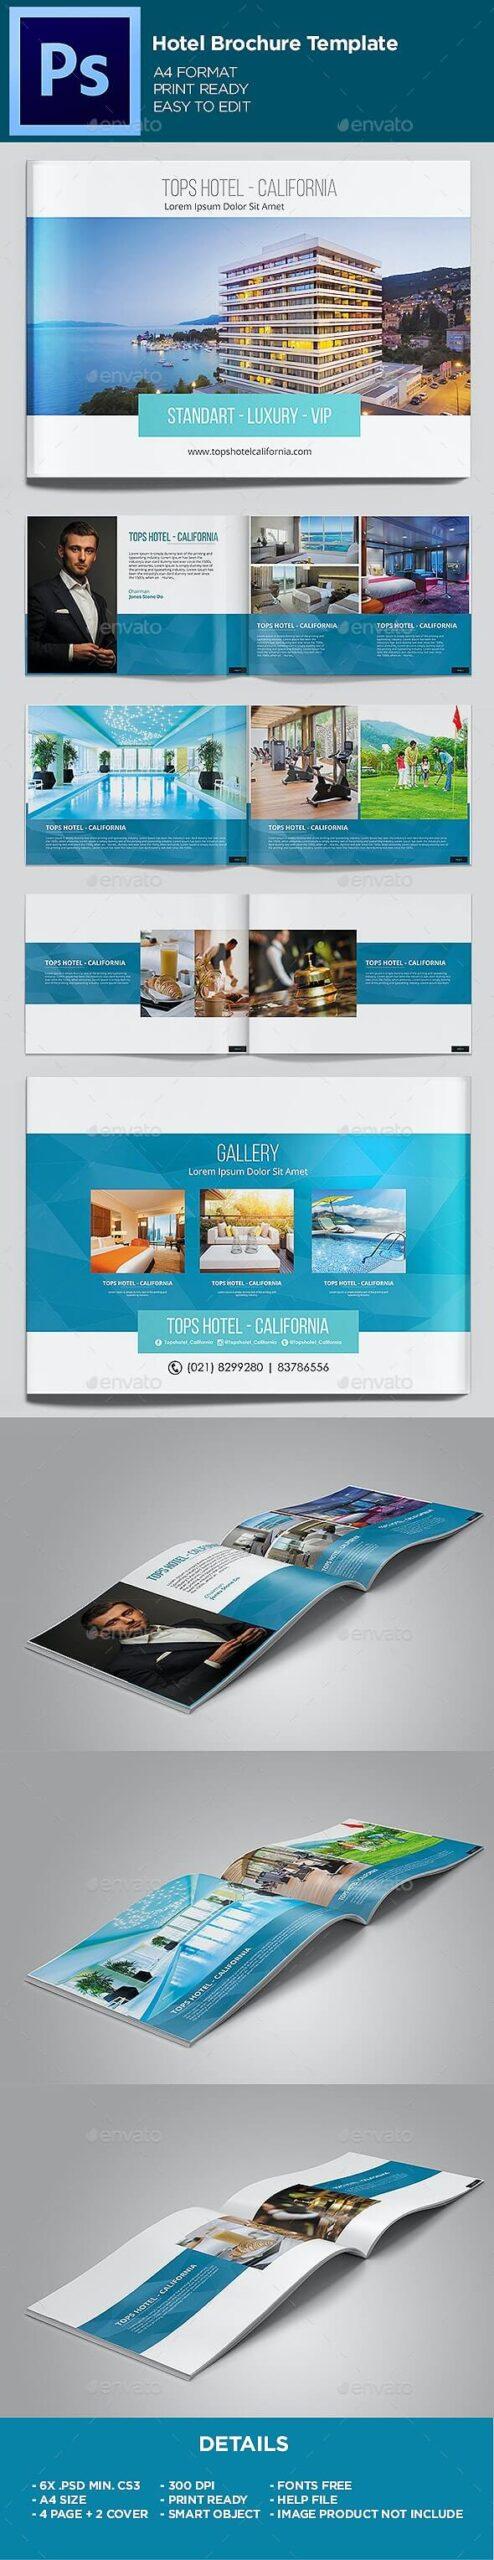 Hotel - Brochure Template